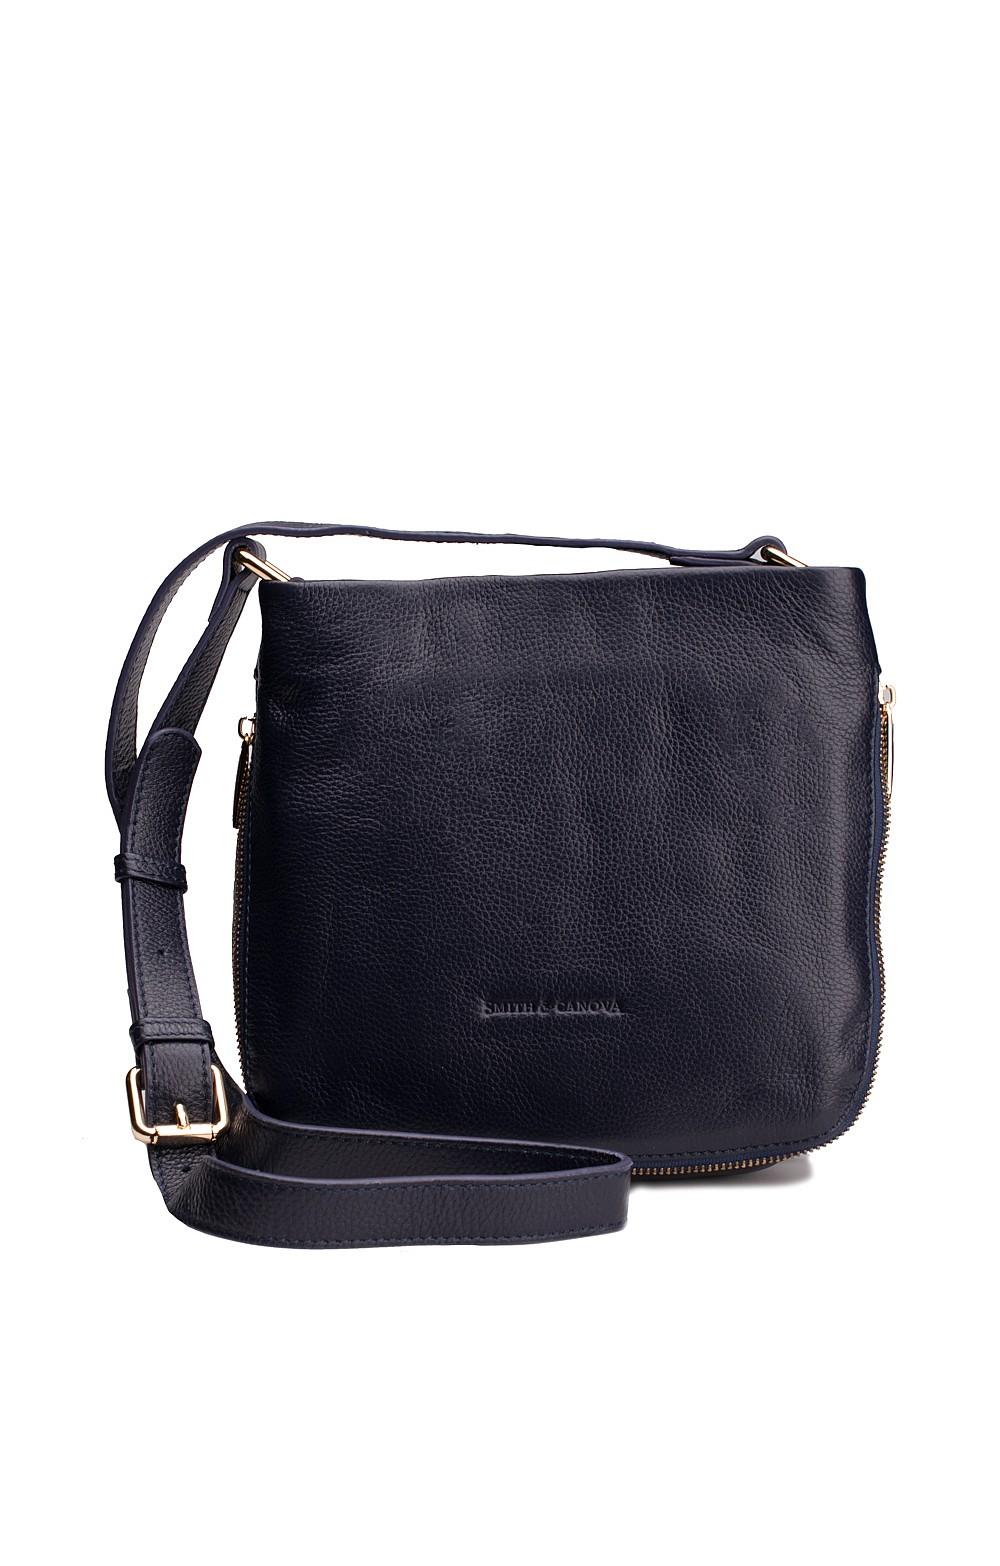 Smith and Canova Zip Side Cross Body Bag - House of Bruar 79cd138e42232